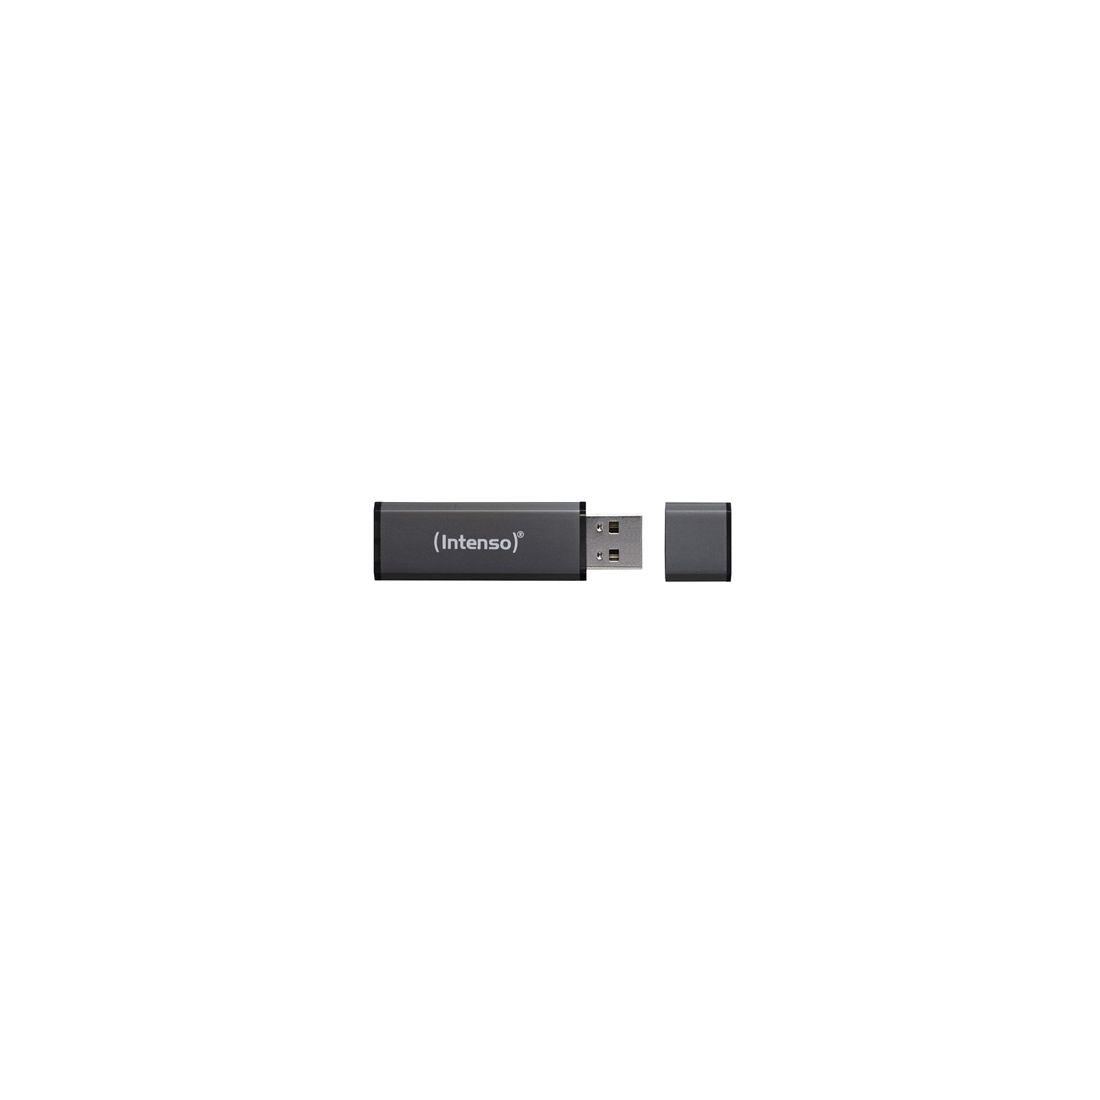 Intenso 3521491 Lapiz USB 20 Alu 64GB Antracita